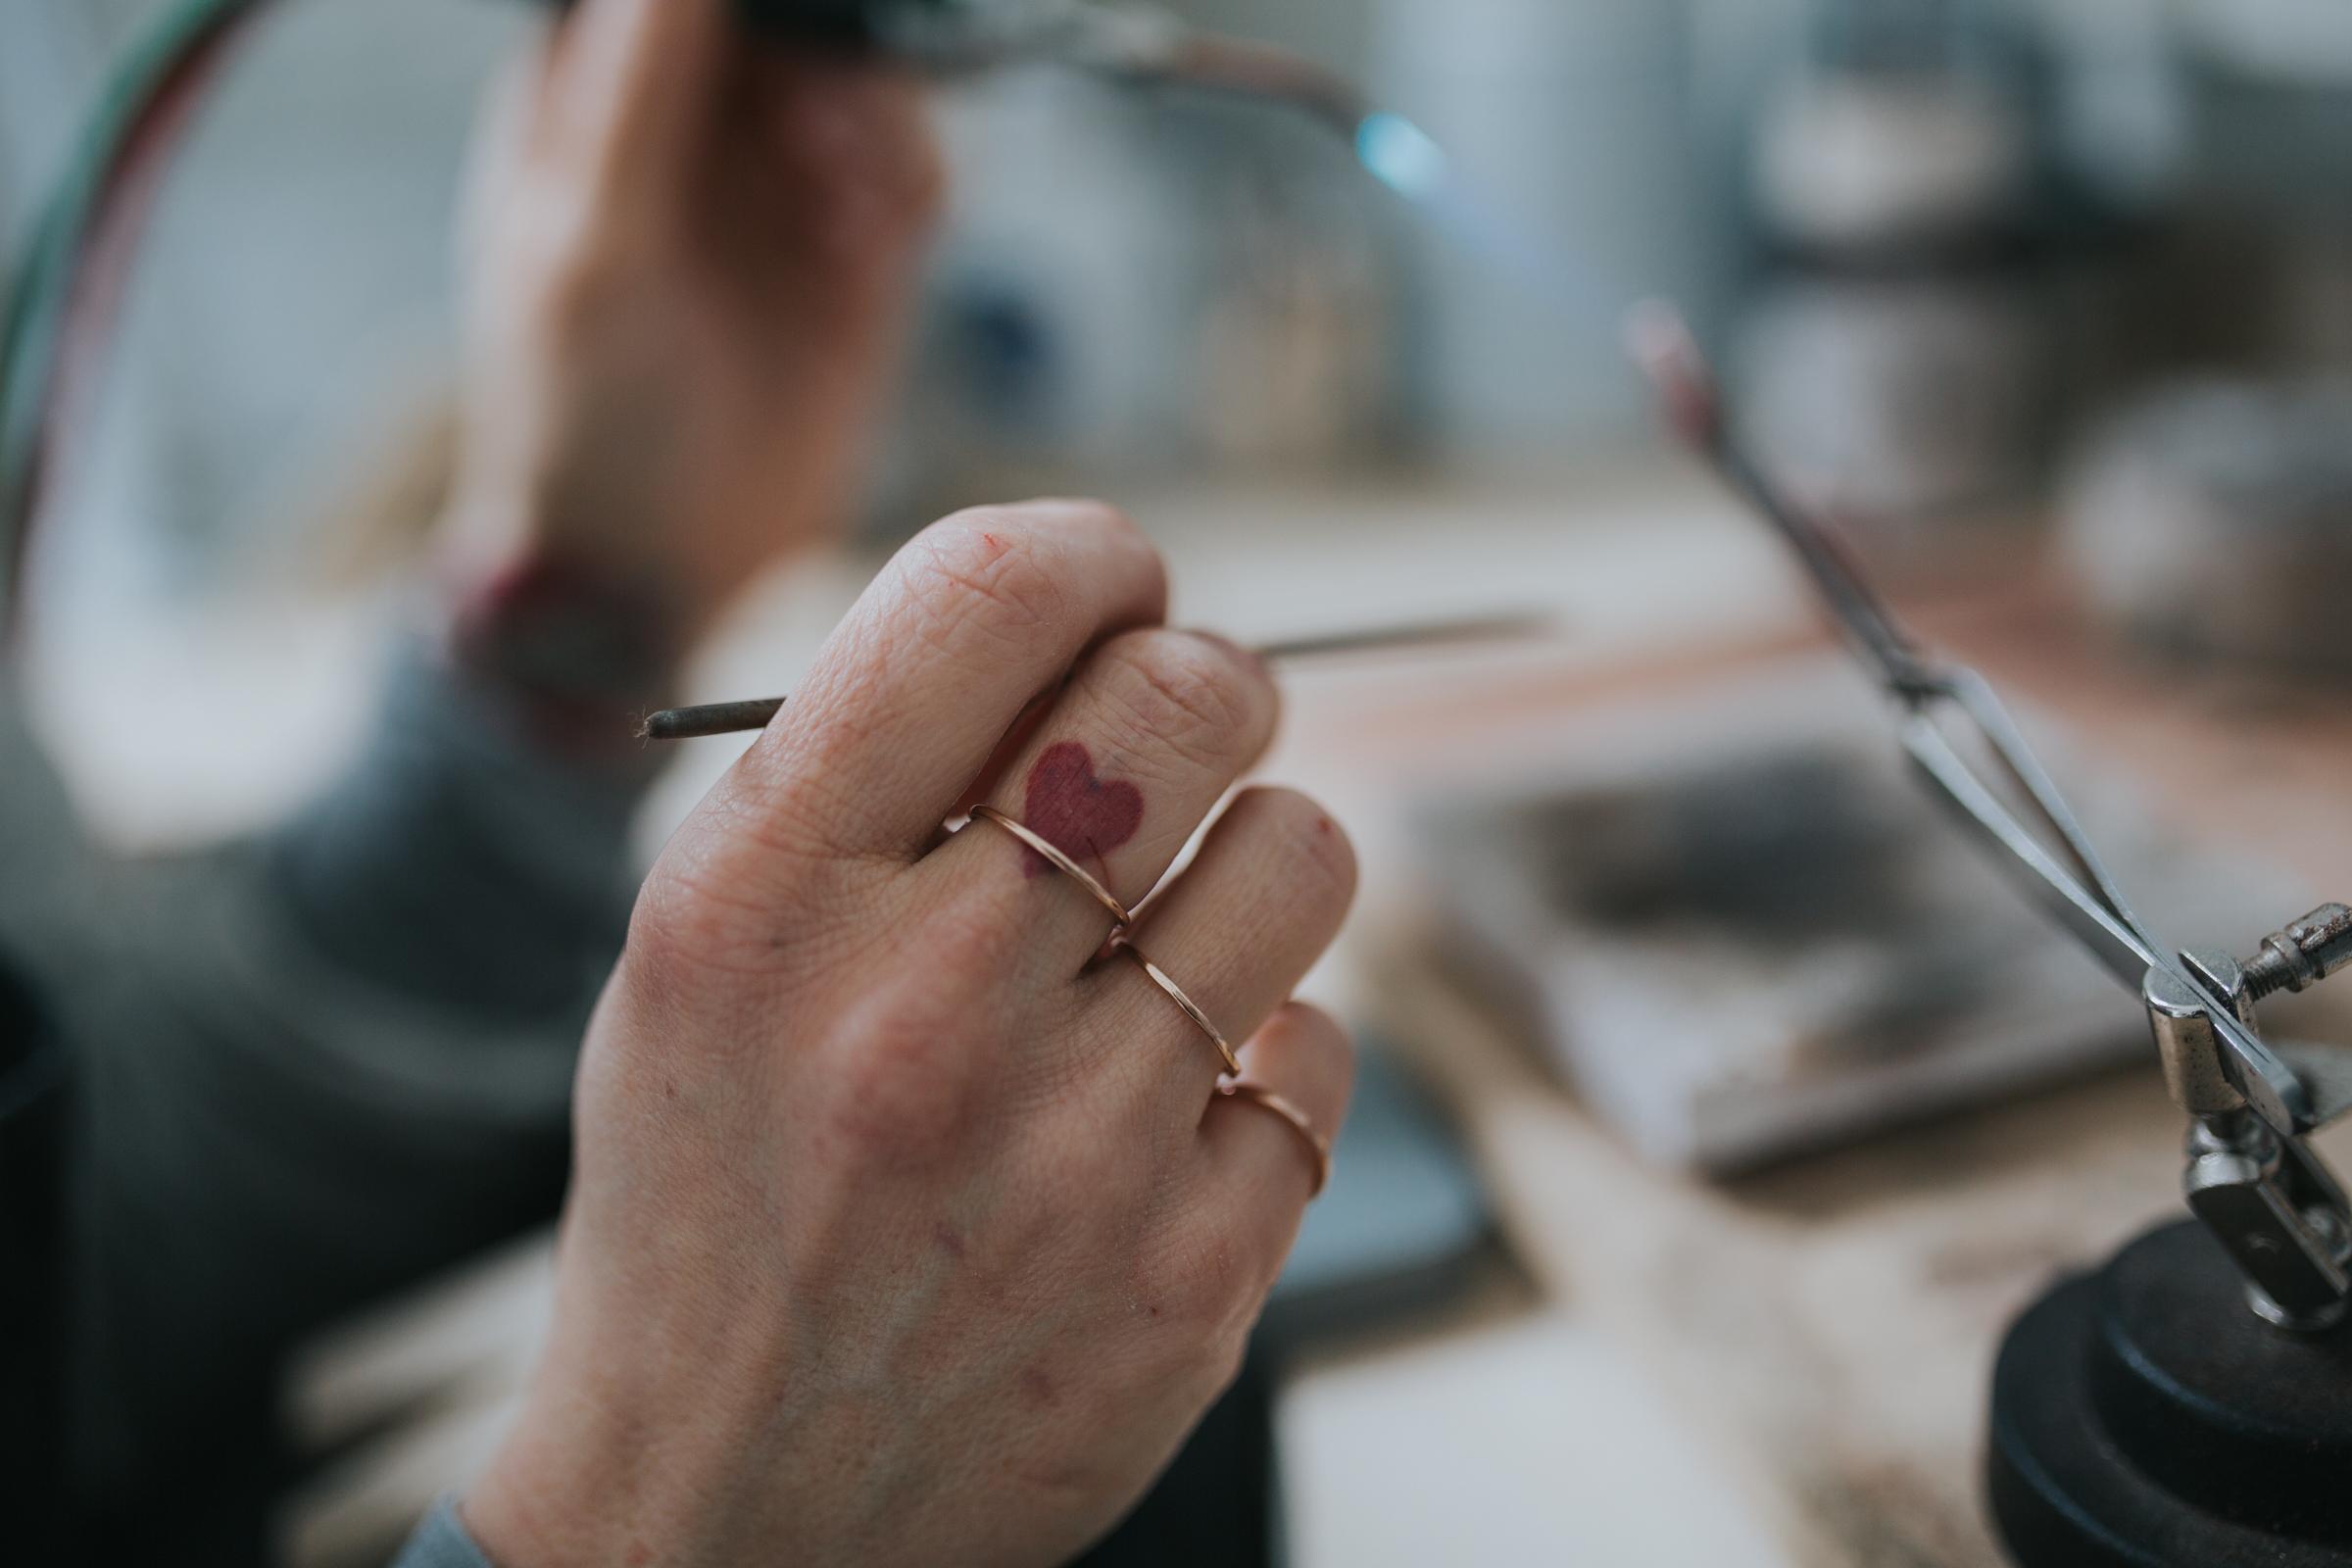 interview-jo-tootsievalentine-fine-designer-jewellery-fair-trade-gold-minas-planet-jasmina-haskovic-london-uk15.jpg